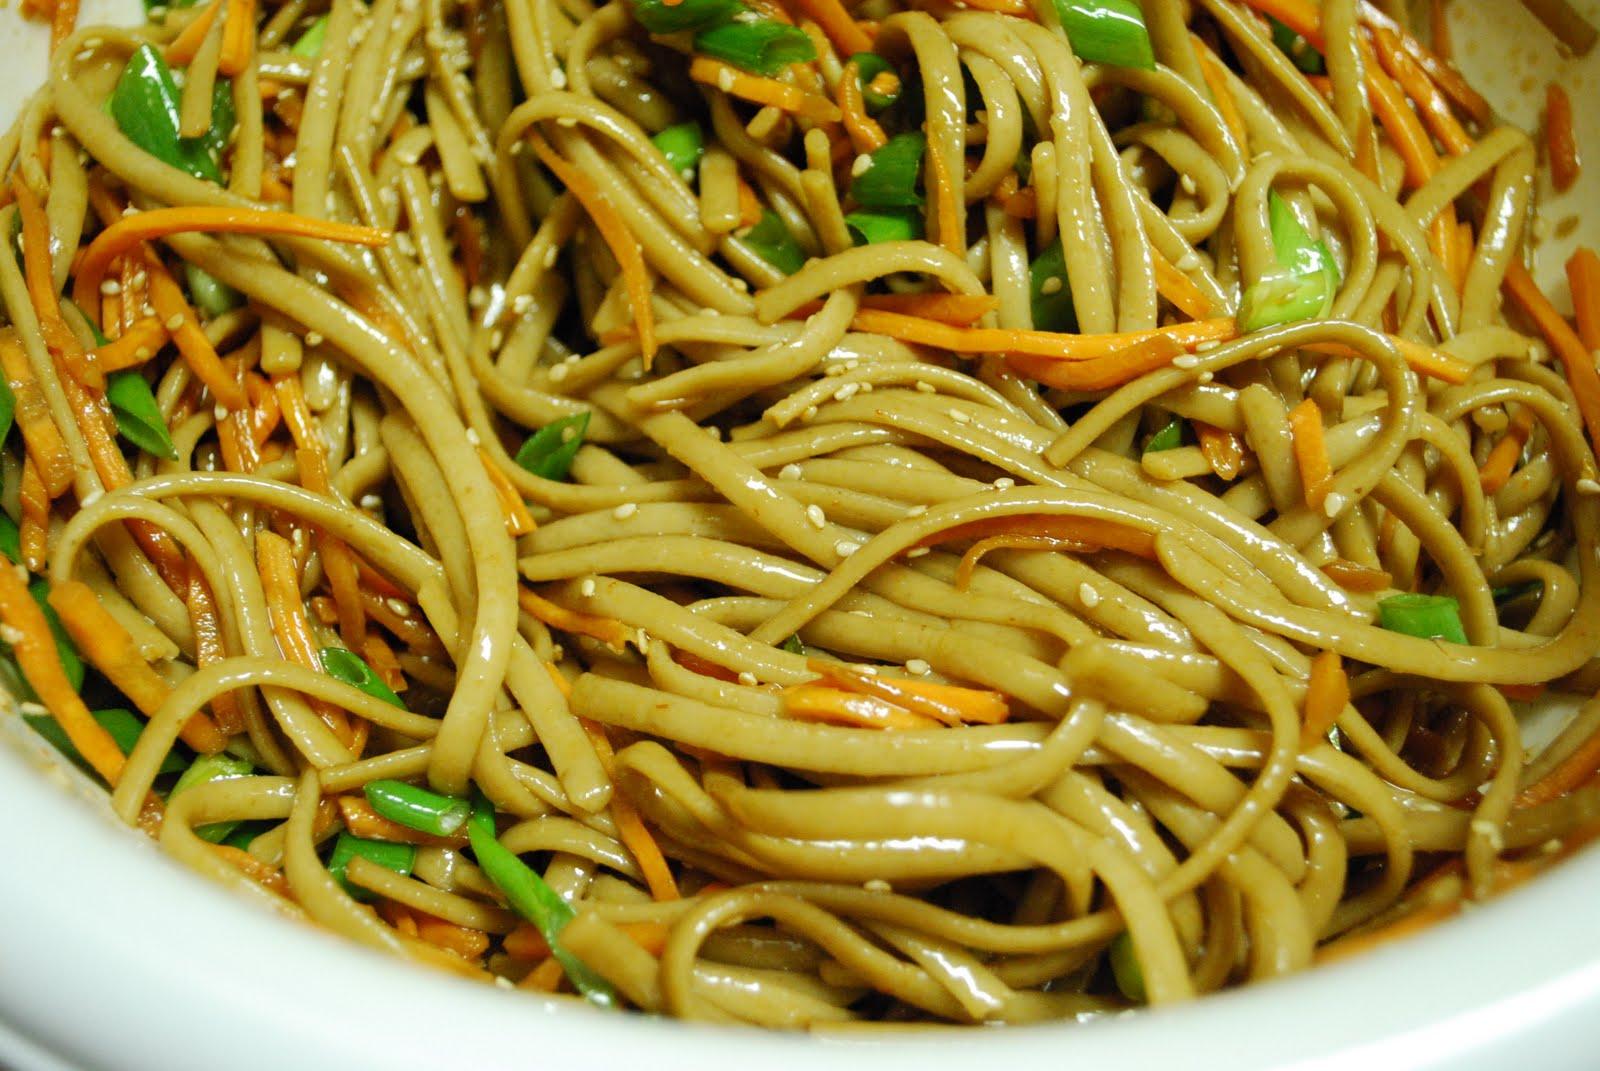 Simply Mangerchine: Improved Sesame Noodles